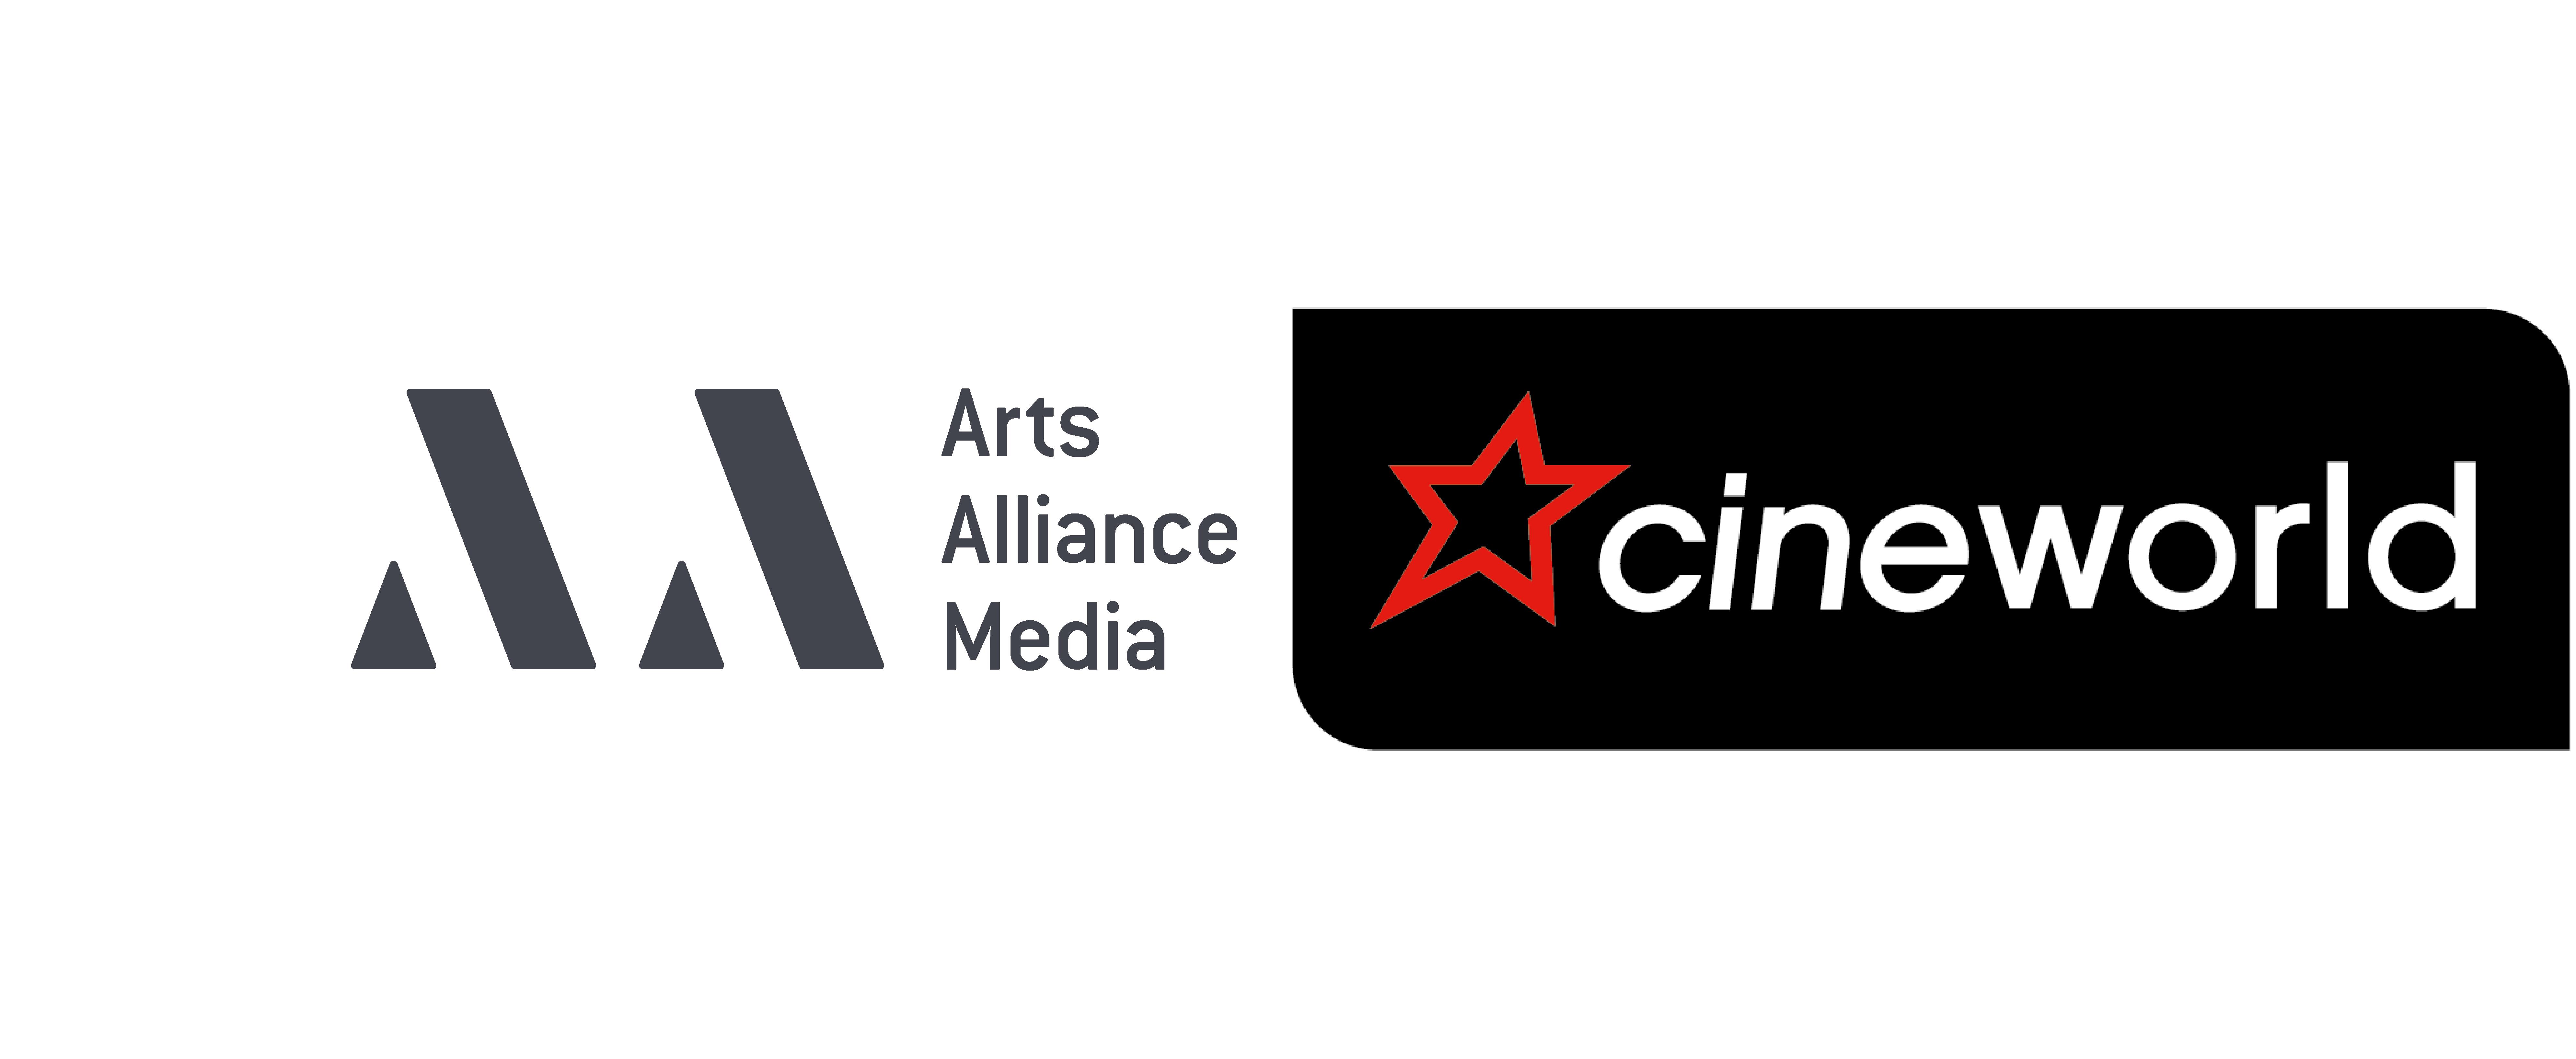 Cineworld Group Extends AAM Software to Regal Cinemas.